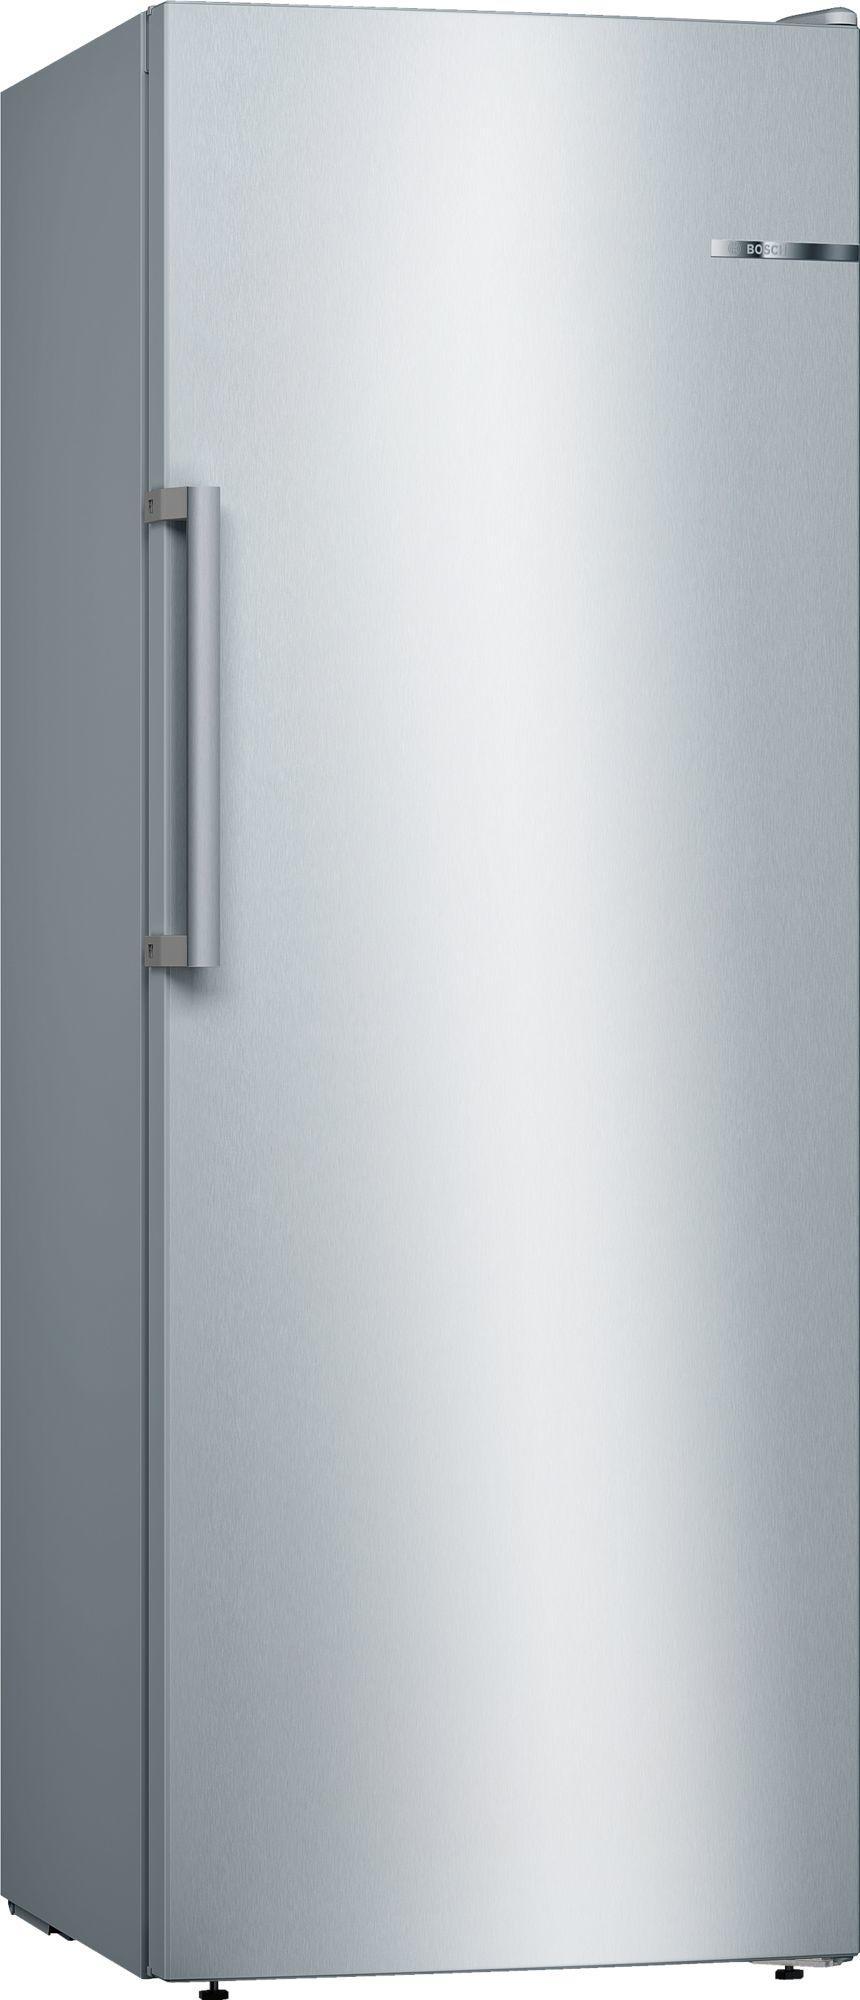 Image of Serie 4 GSN29VLEP 60cm 200 Litre Frost Free Single Door Freezer | Silver Innox